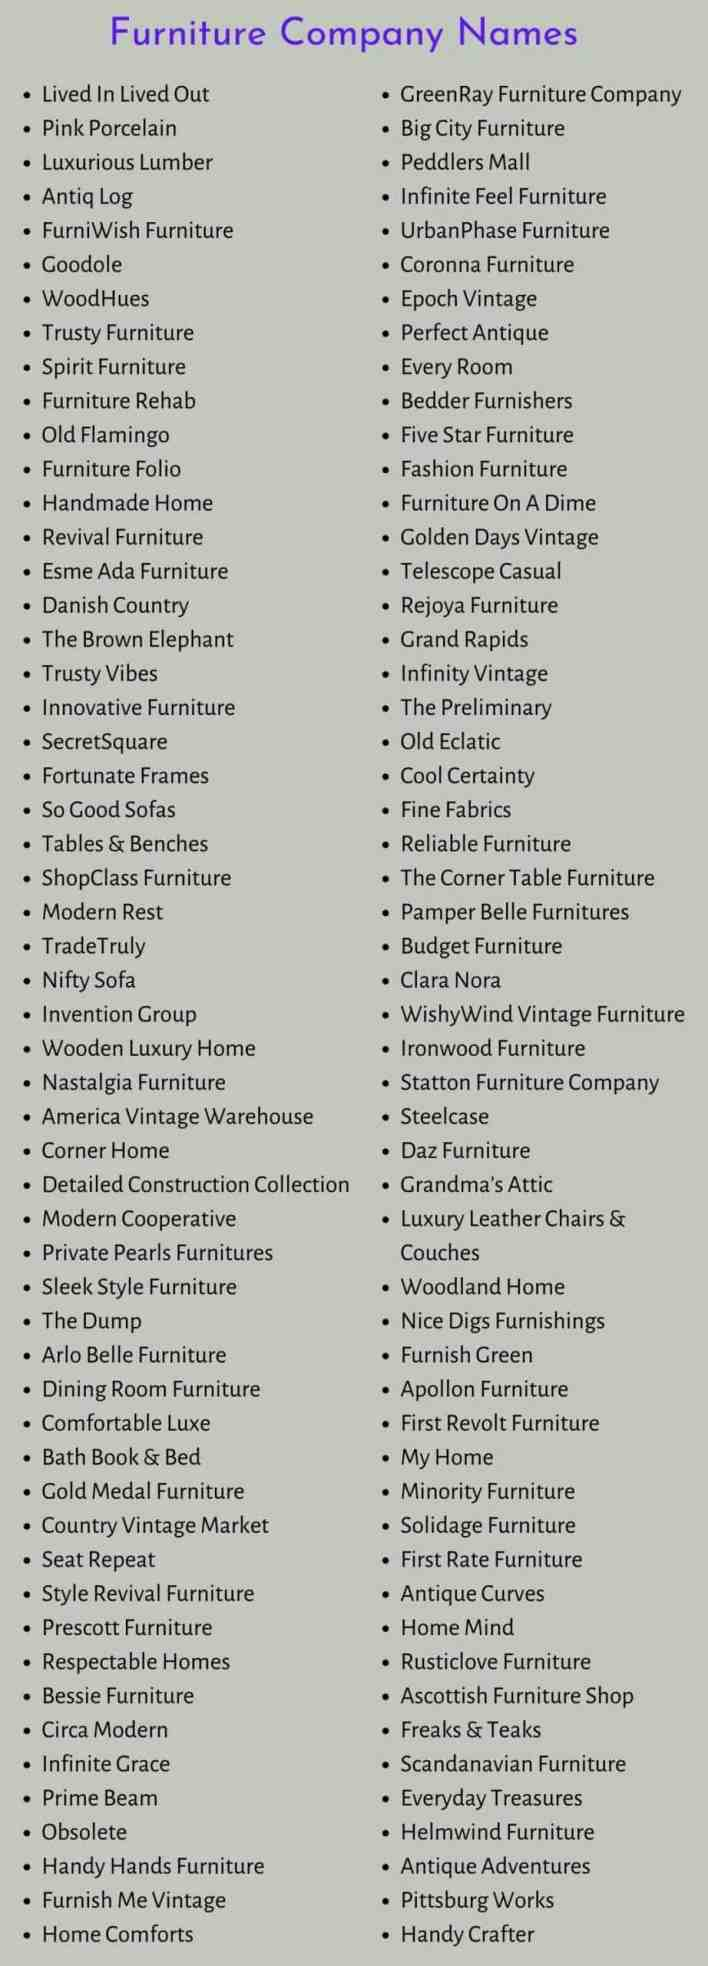 Furniture Company Names